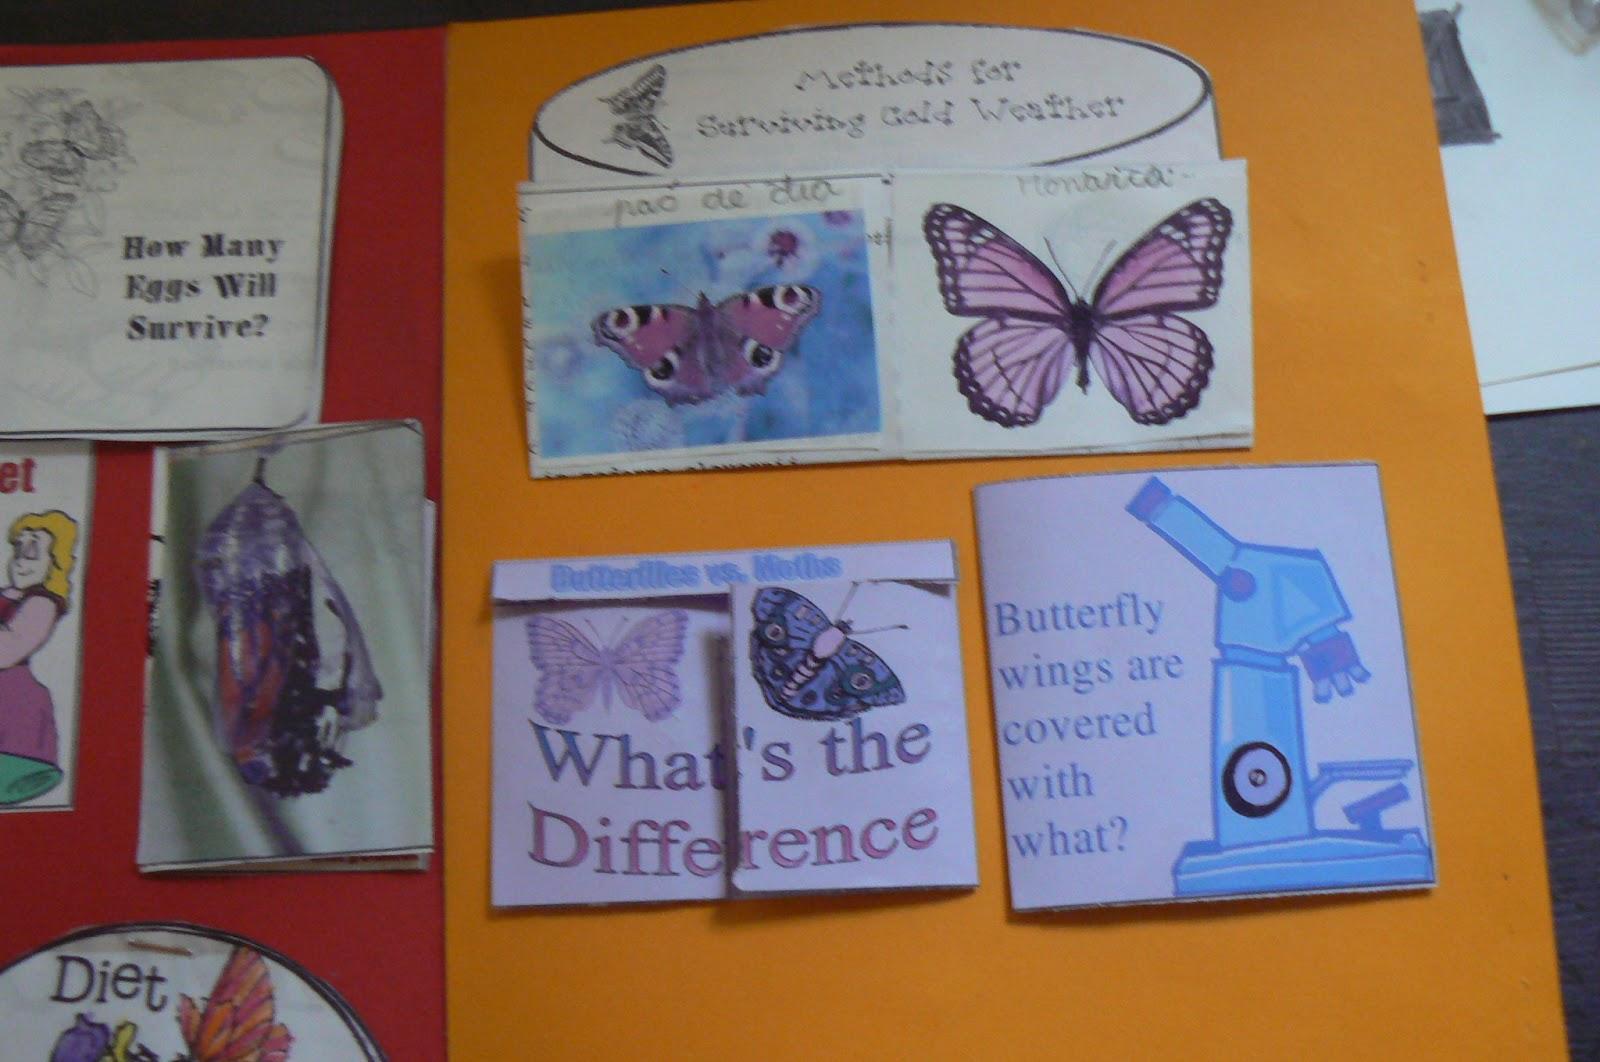 Orca Observar Recordar Crecer Y Aprender Libreta De Dibujo: Orca: Observar, Recordar, Crecer Y Aprender: Lapbook Mariposas